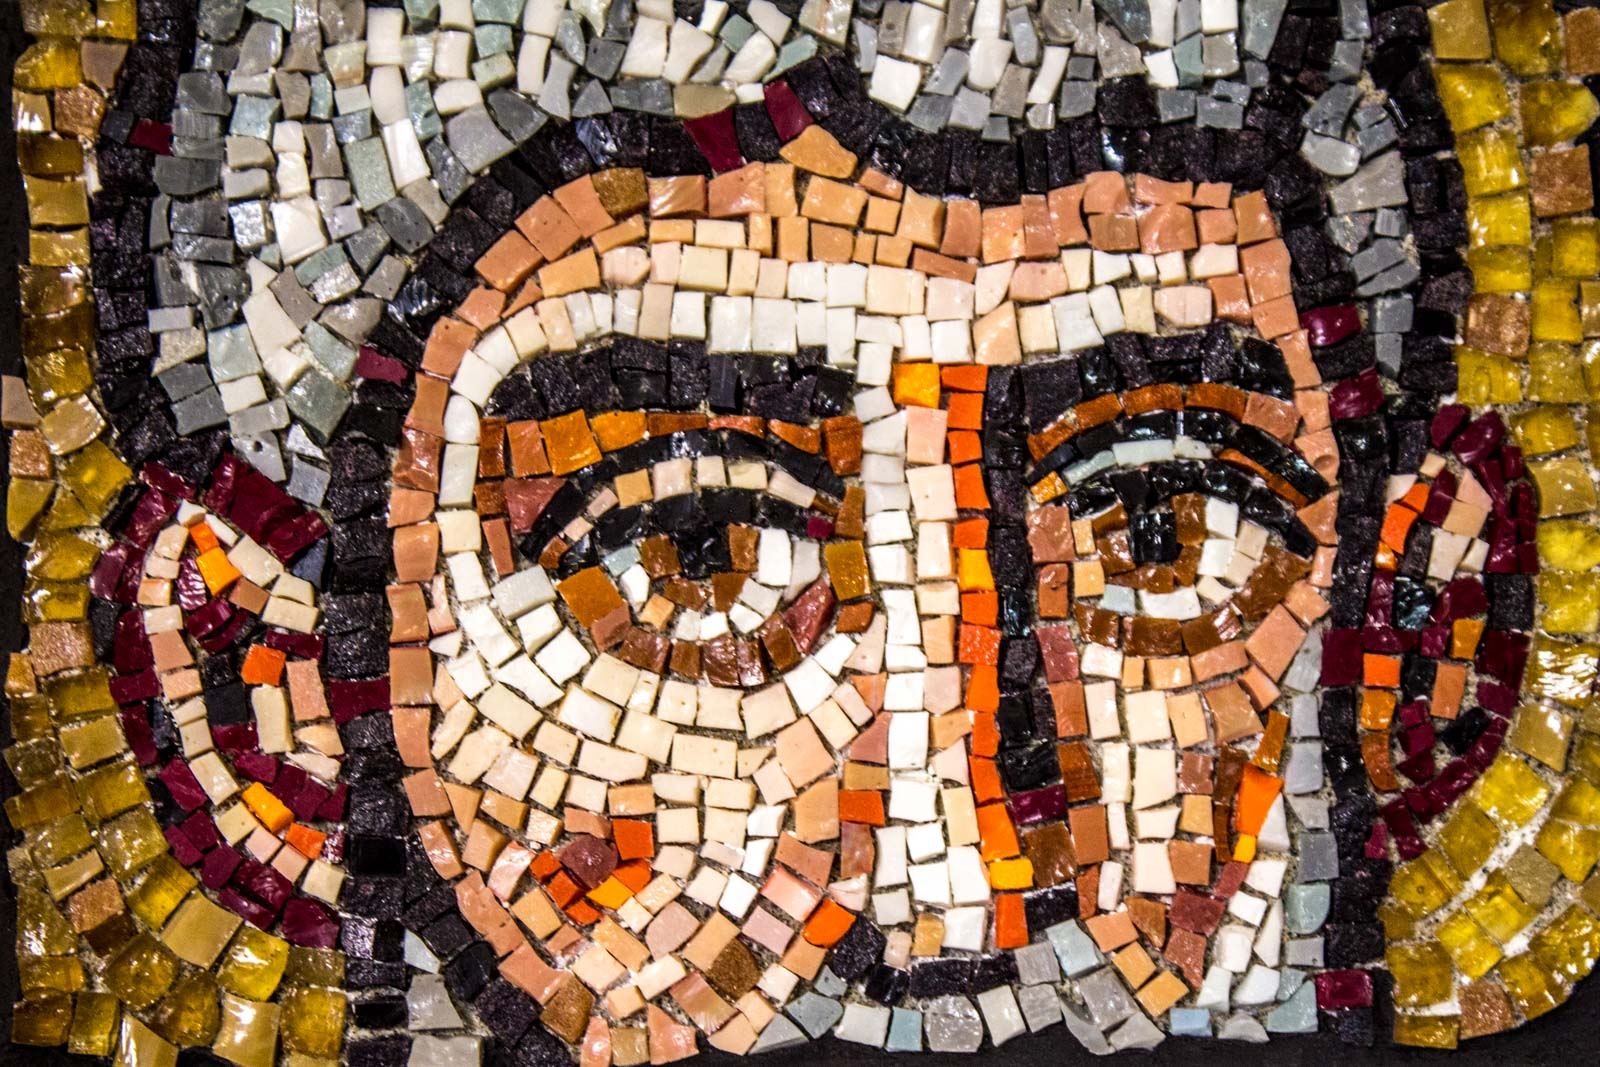 ravenna mosaics, mosaic art, koko mosaico, luca barberini